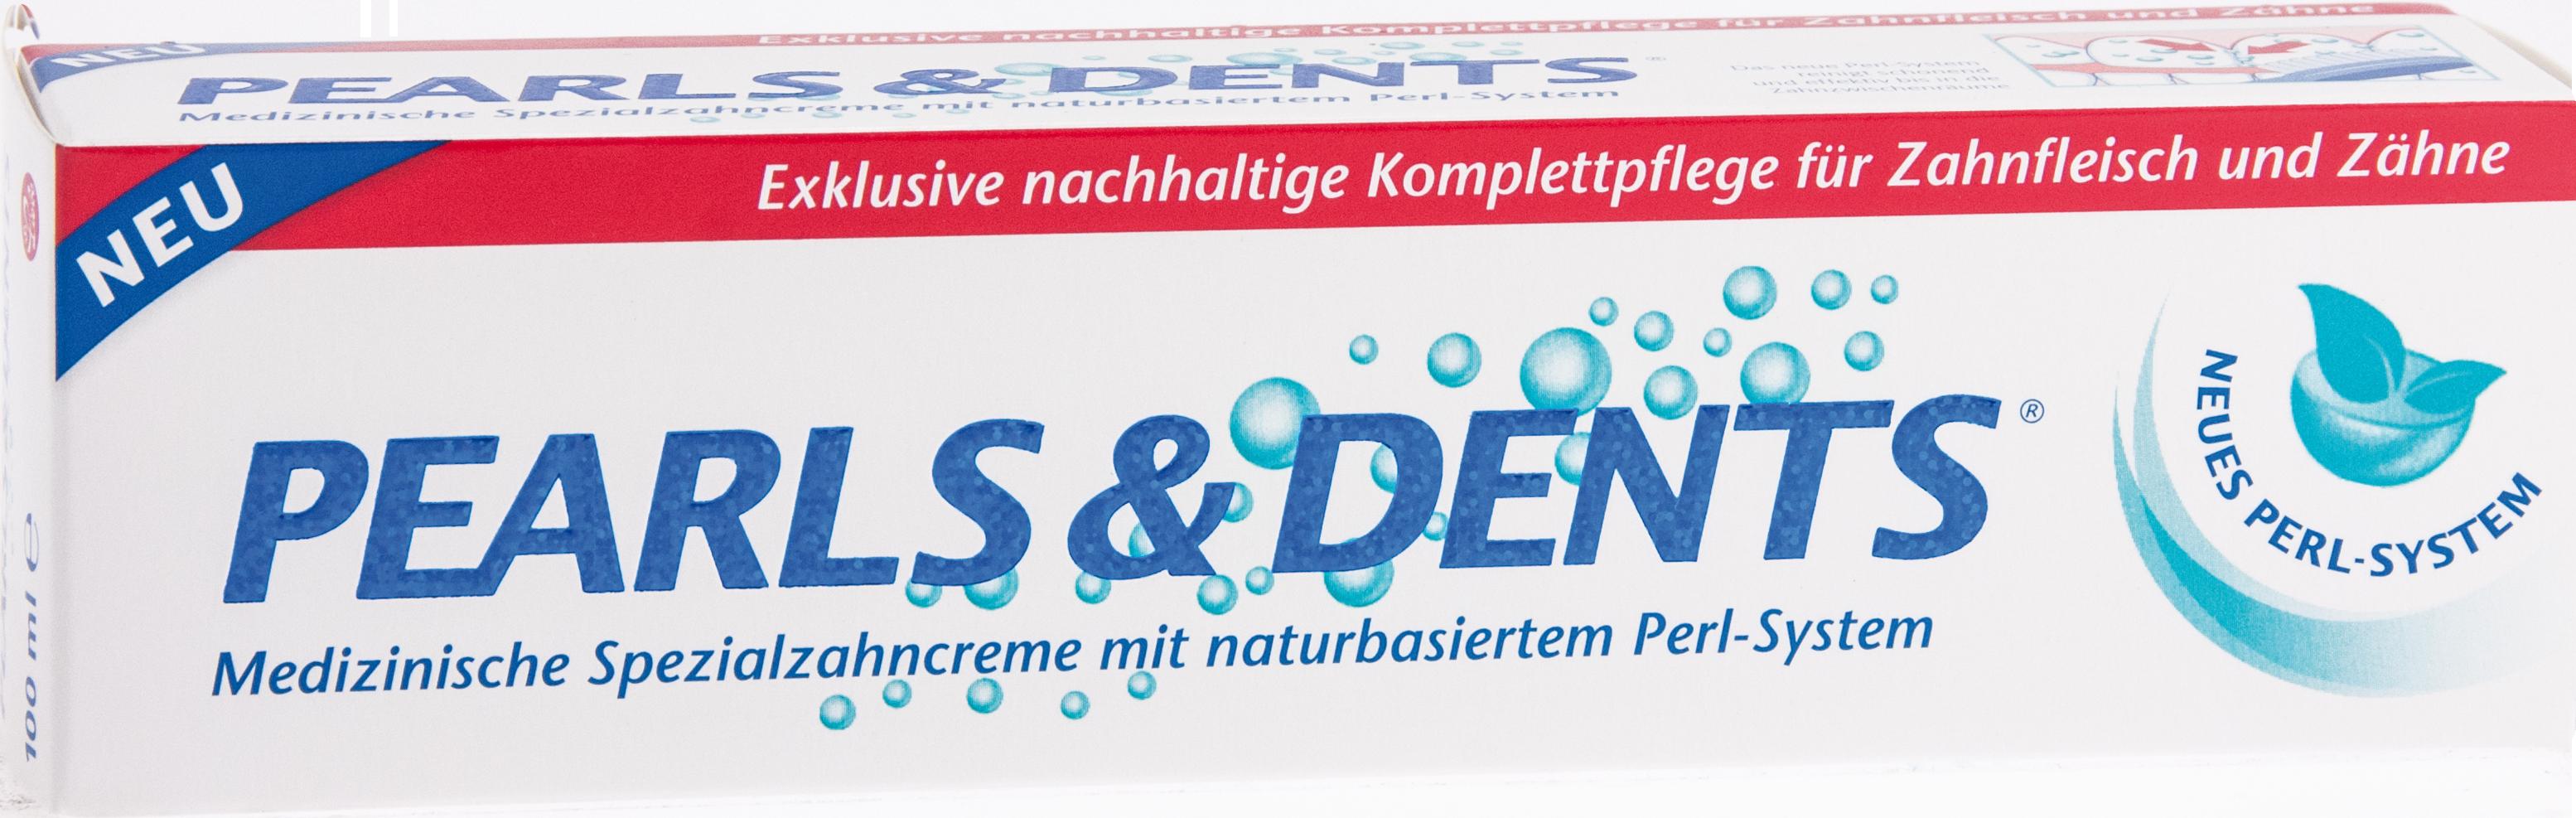 Pearls & Dents Spezialzahncreme m.nat. Perlsystem